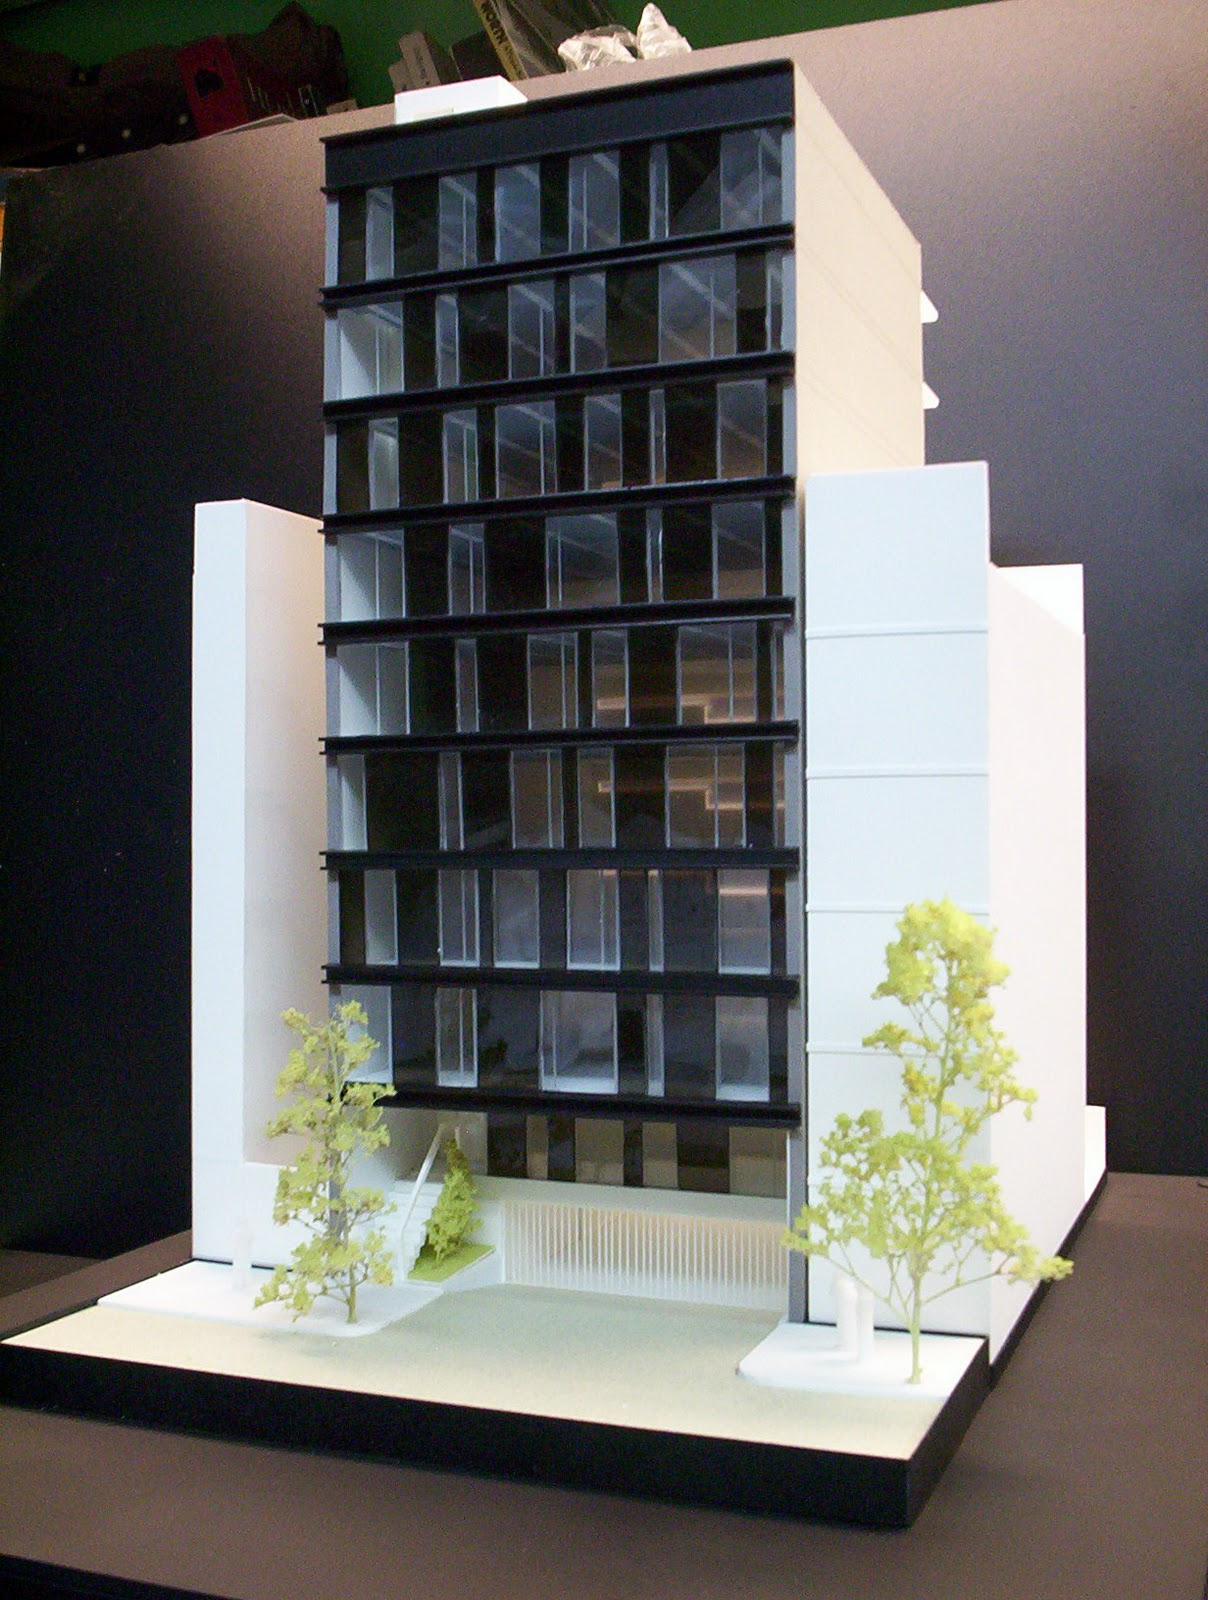 Maqueta de edificio de oficinas - Edificio de oficinas ...